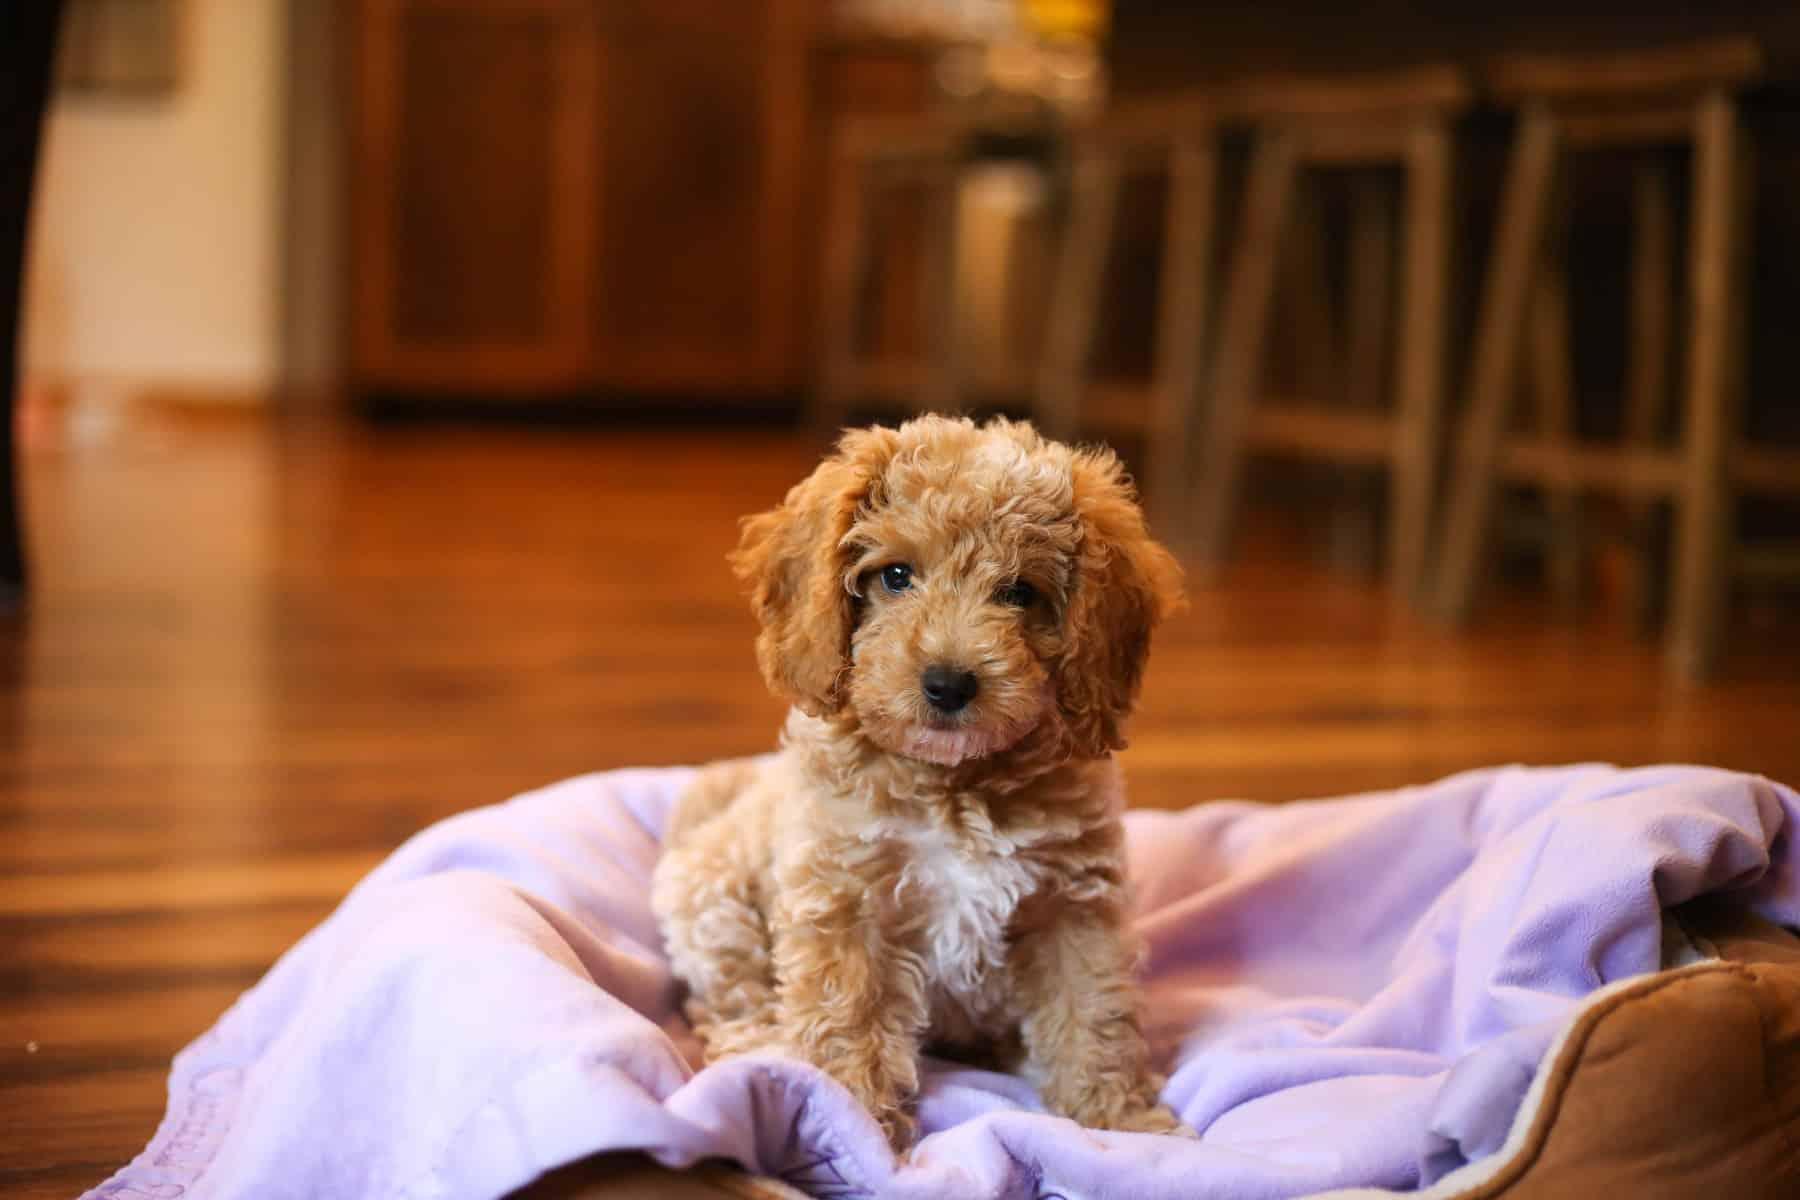 Puppy Checklist: 3 Essentials For Bringing Your New Dog Home